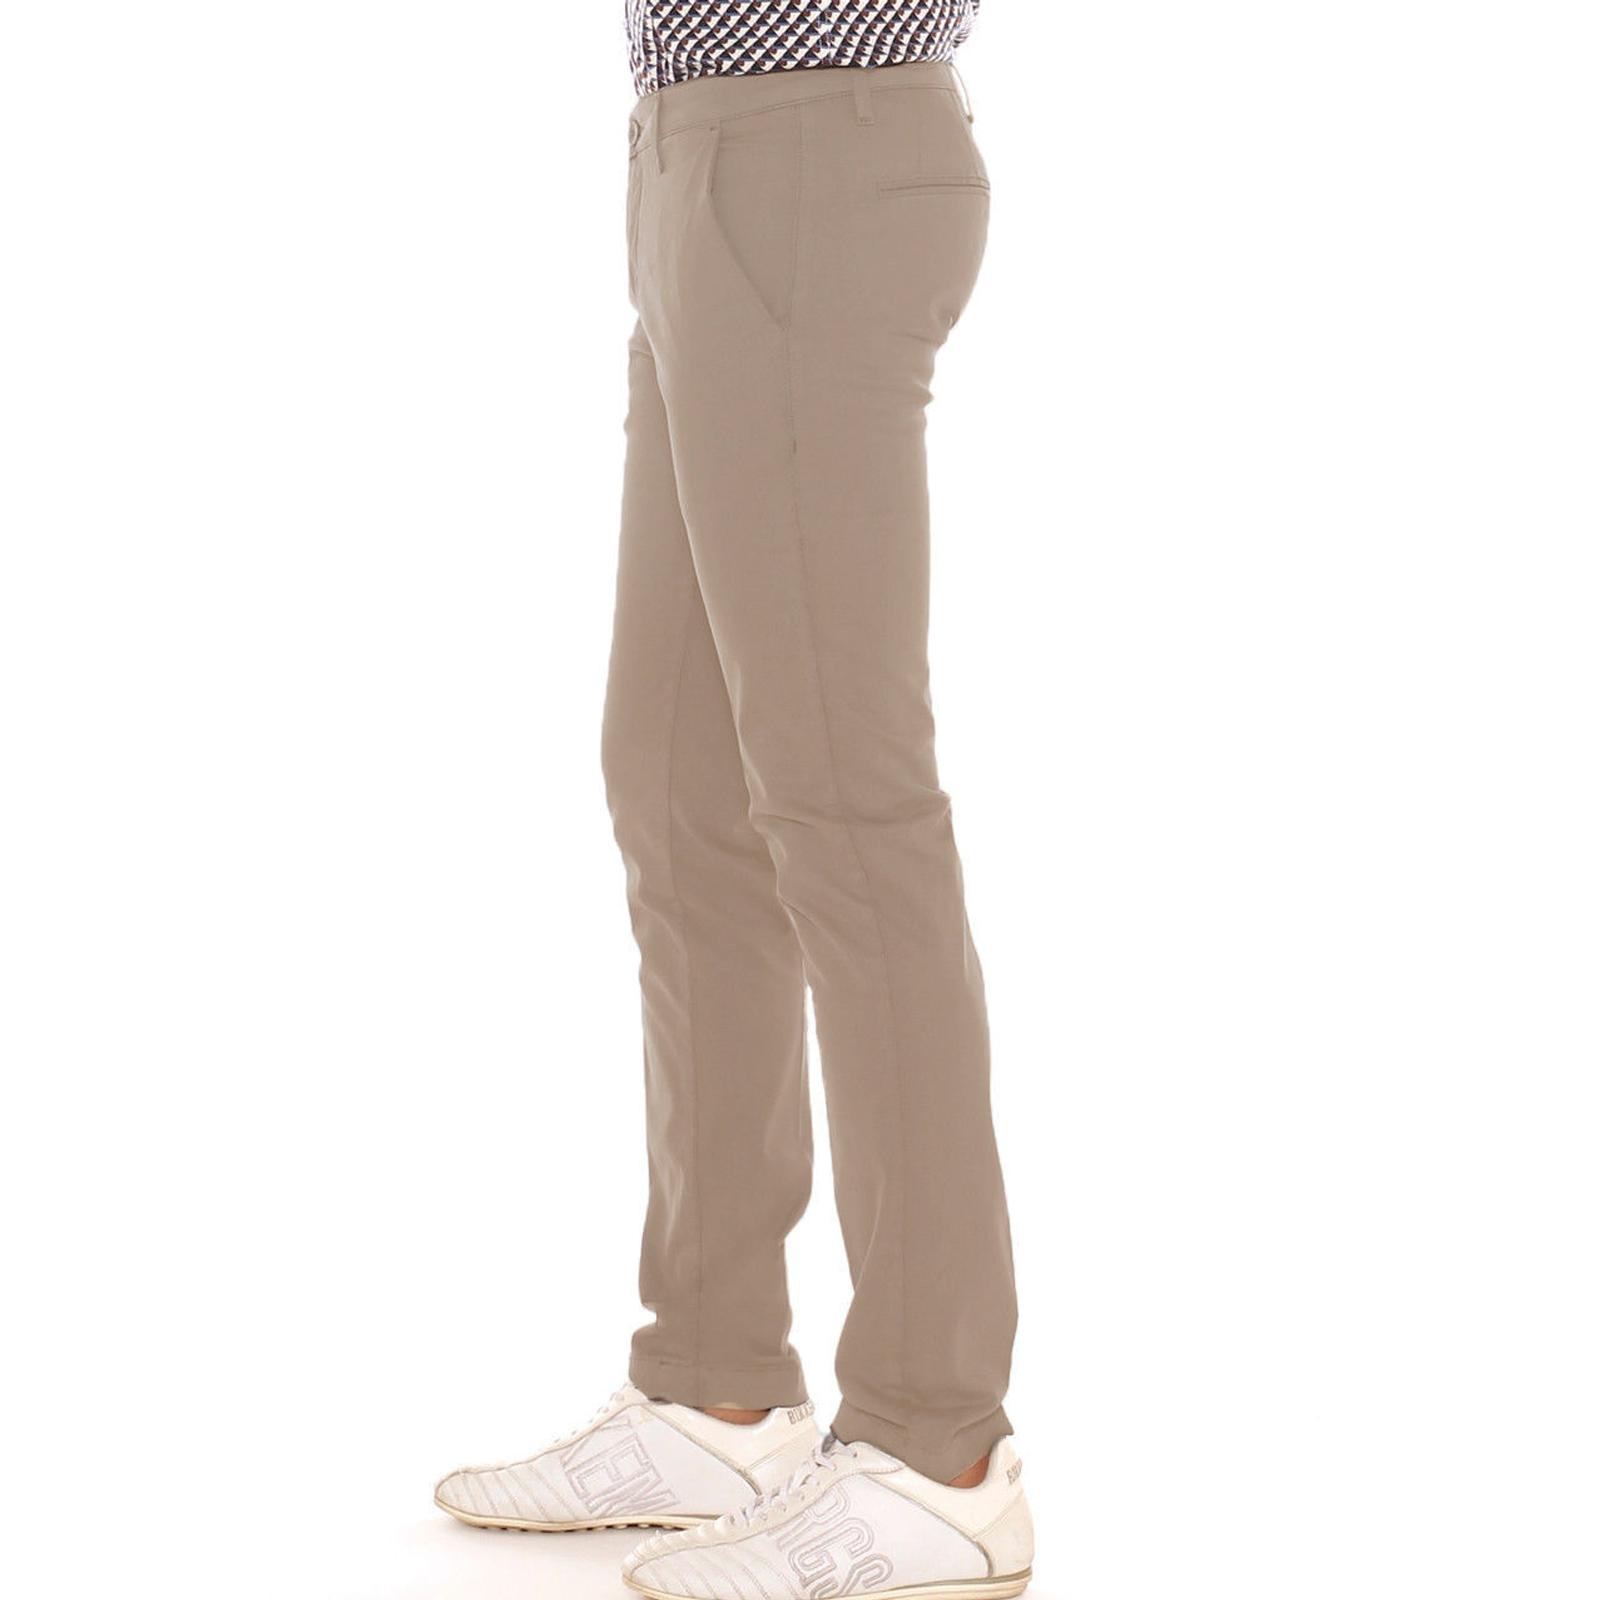 Pantalone-Uomo-Slim-fit-Chino-Elegante-Invernale-America-Cotone-Tasca-america miniatura 26